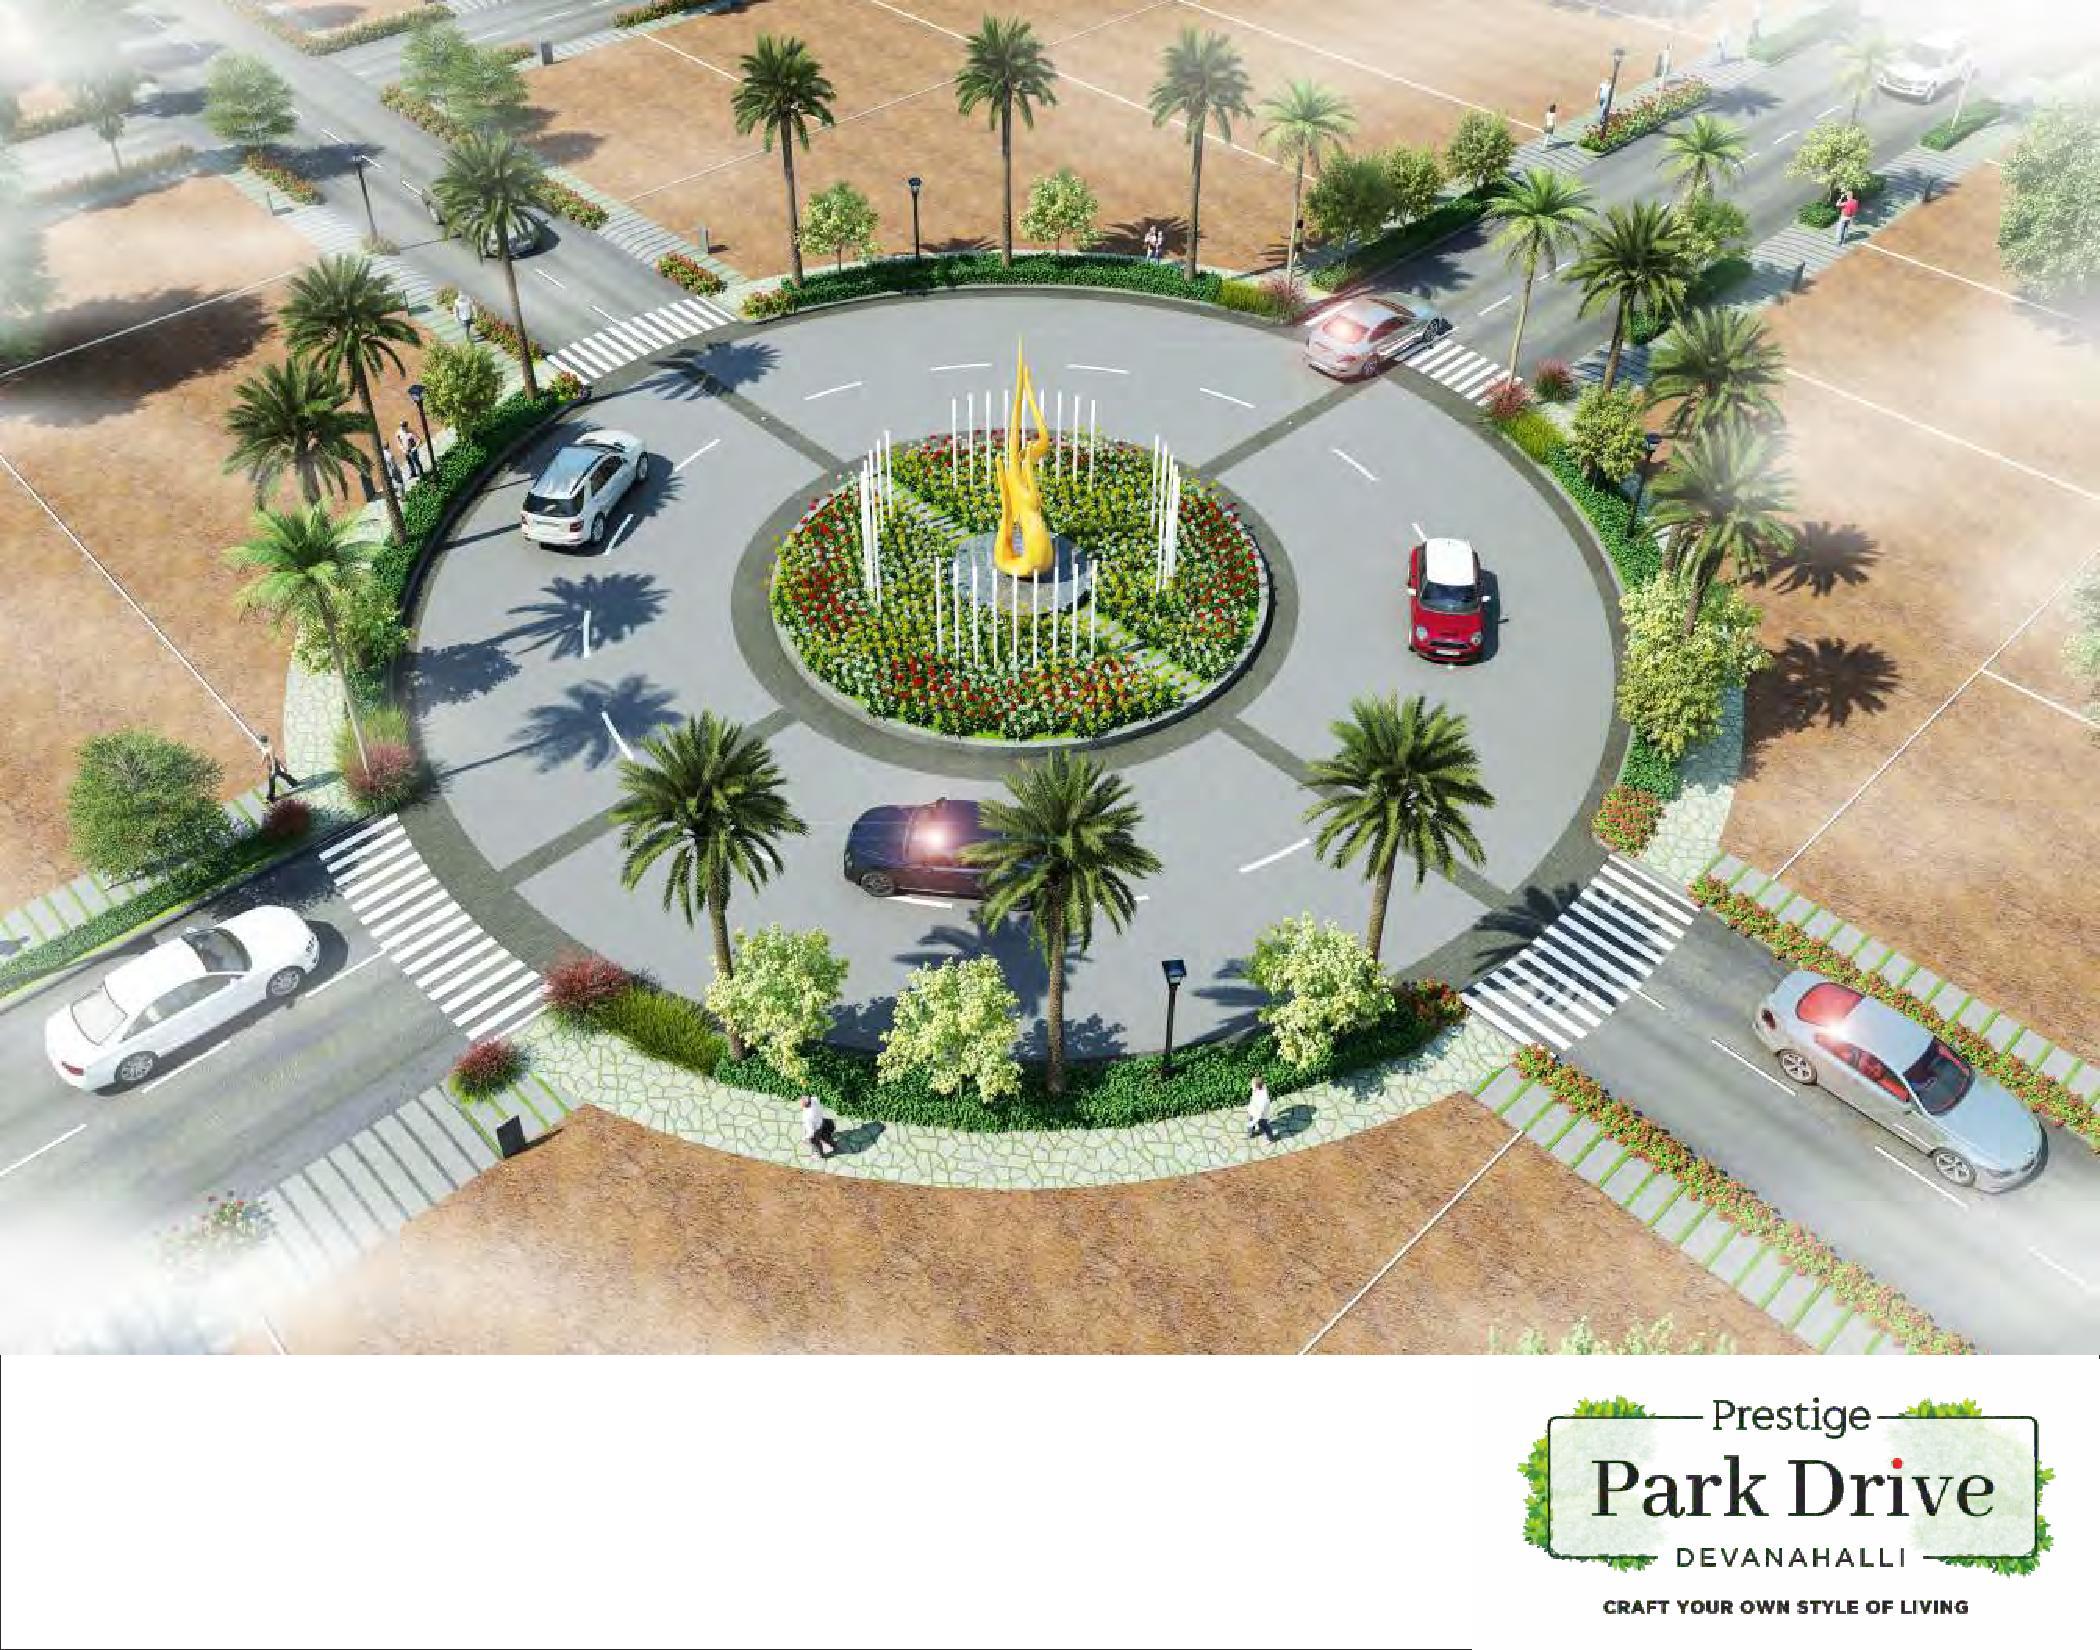 Prestige-Park-Drive-Plot-in-Devanahalli-Bangalore-Image-05